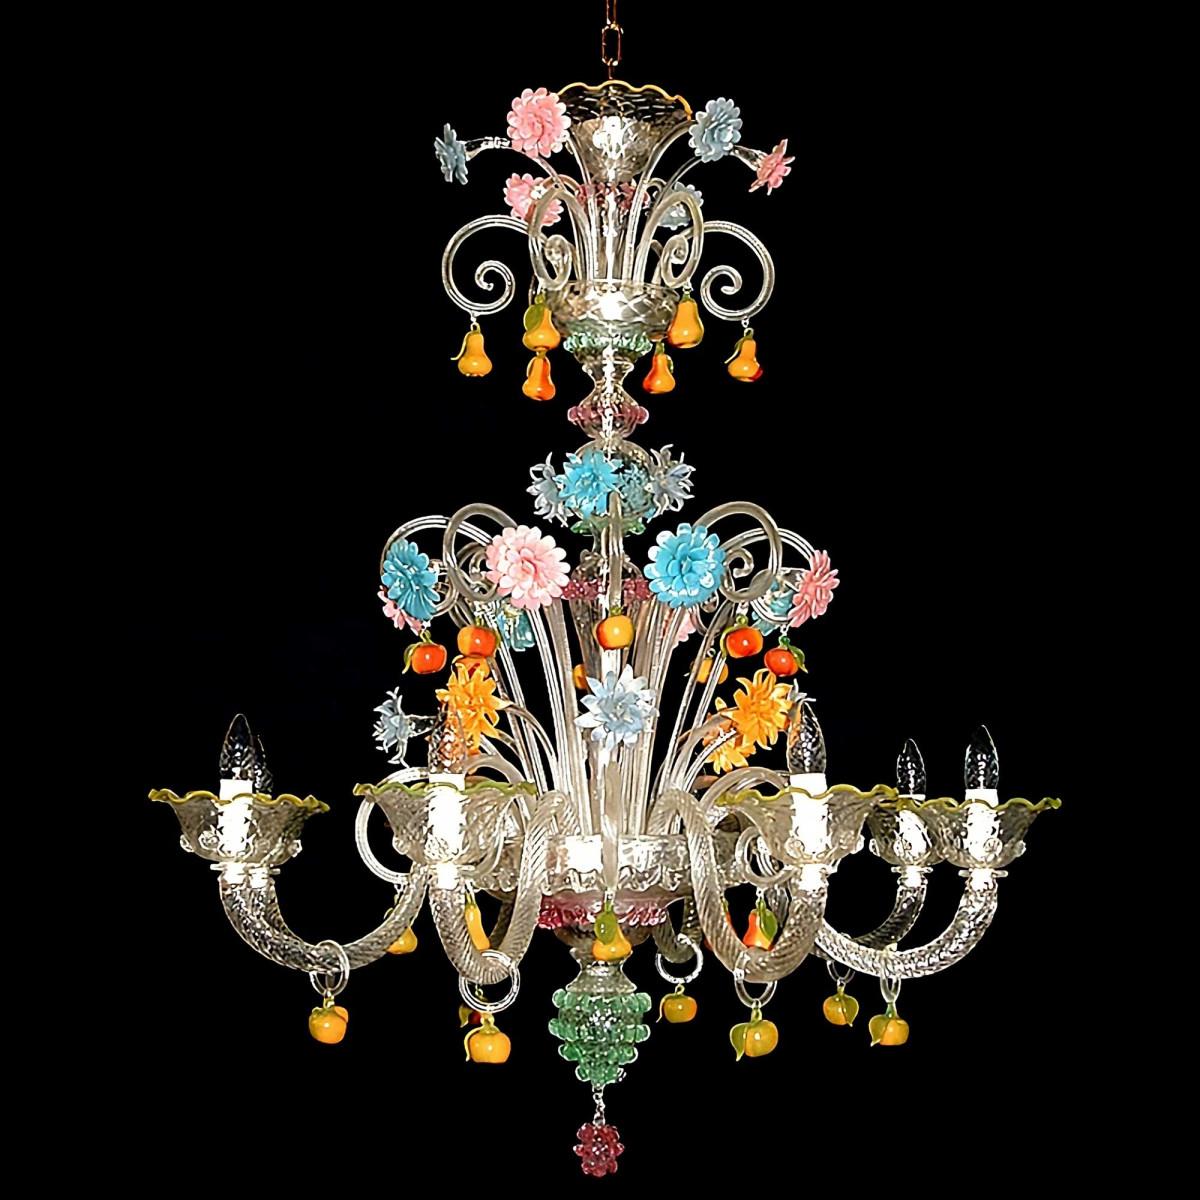 Tripudio 8 lumières lustre en verre de Murano